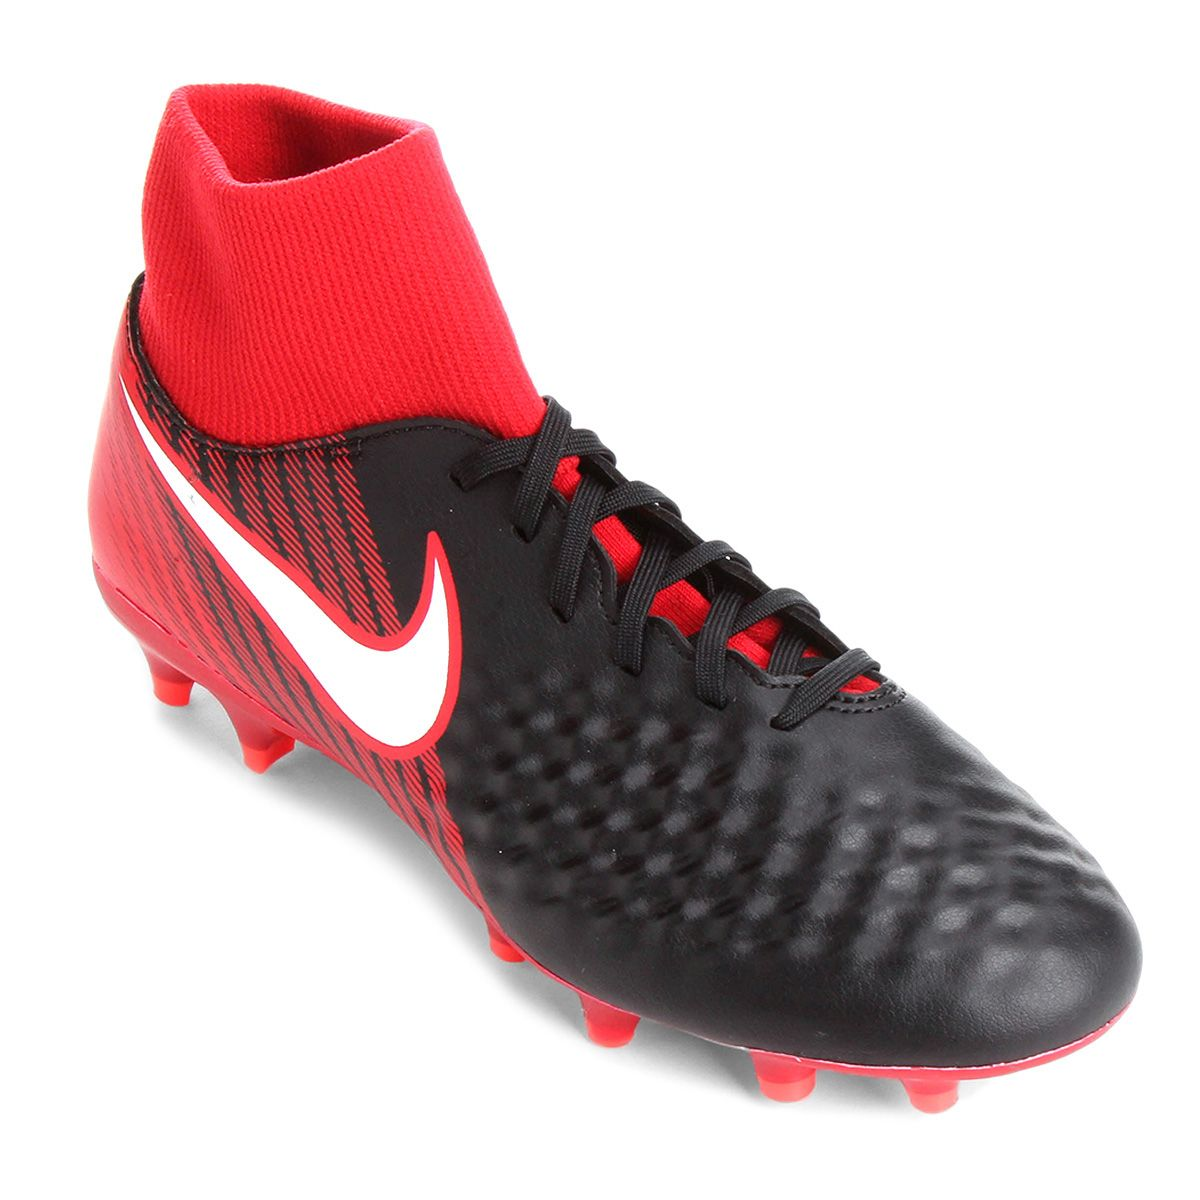 Chuteira Nike Botinha Magista Onda II DF FG Campo - Stigli e4ad98743bc6f